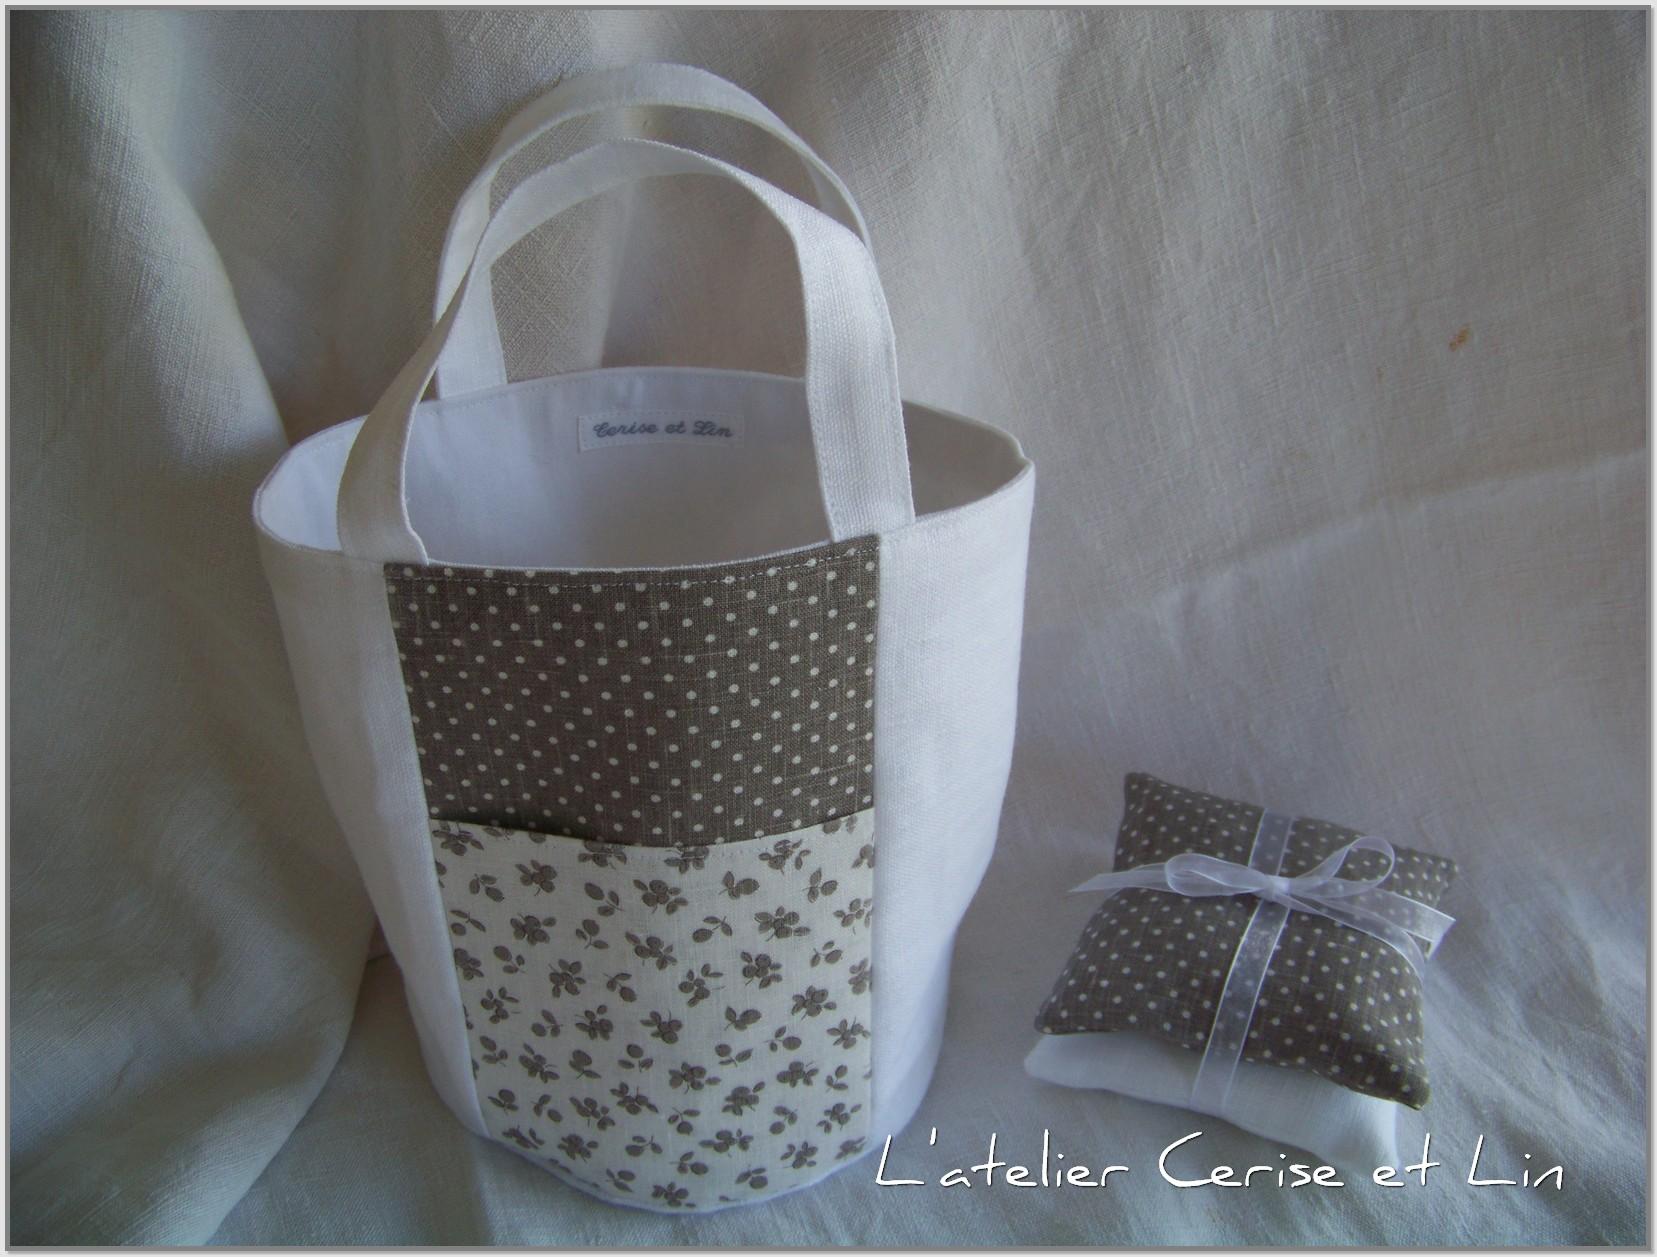 m s de 1000 im genes sobre couture en pinterest tuto sac costura y bolso de lavanda. Black Bedroom Furniture Sets. Home Design Ideas